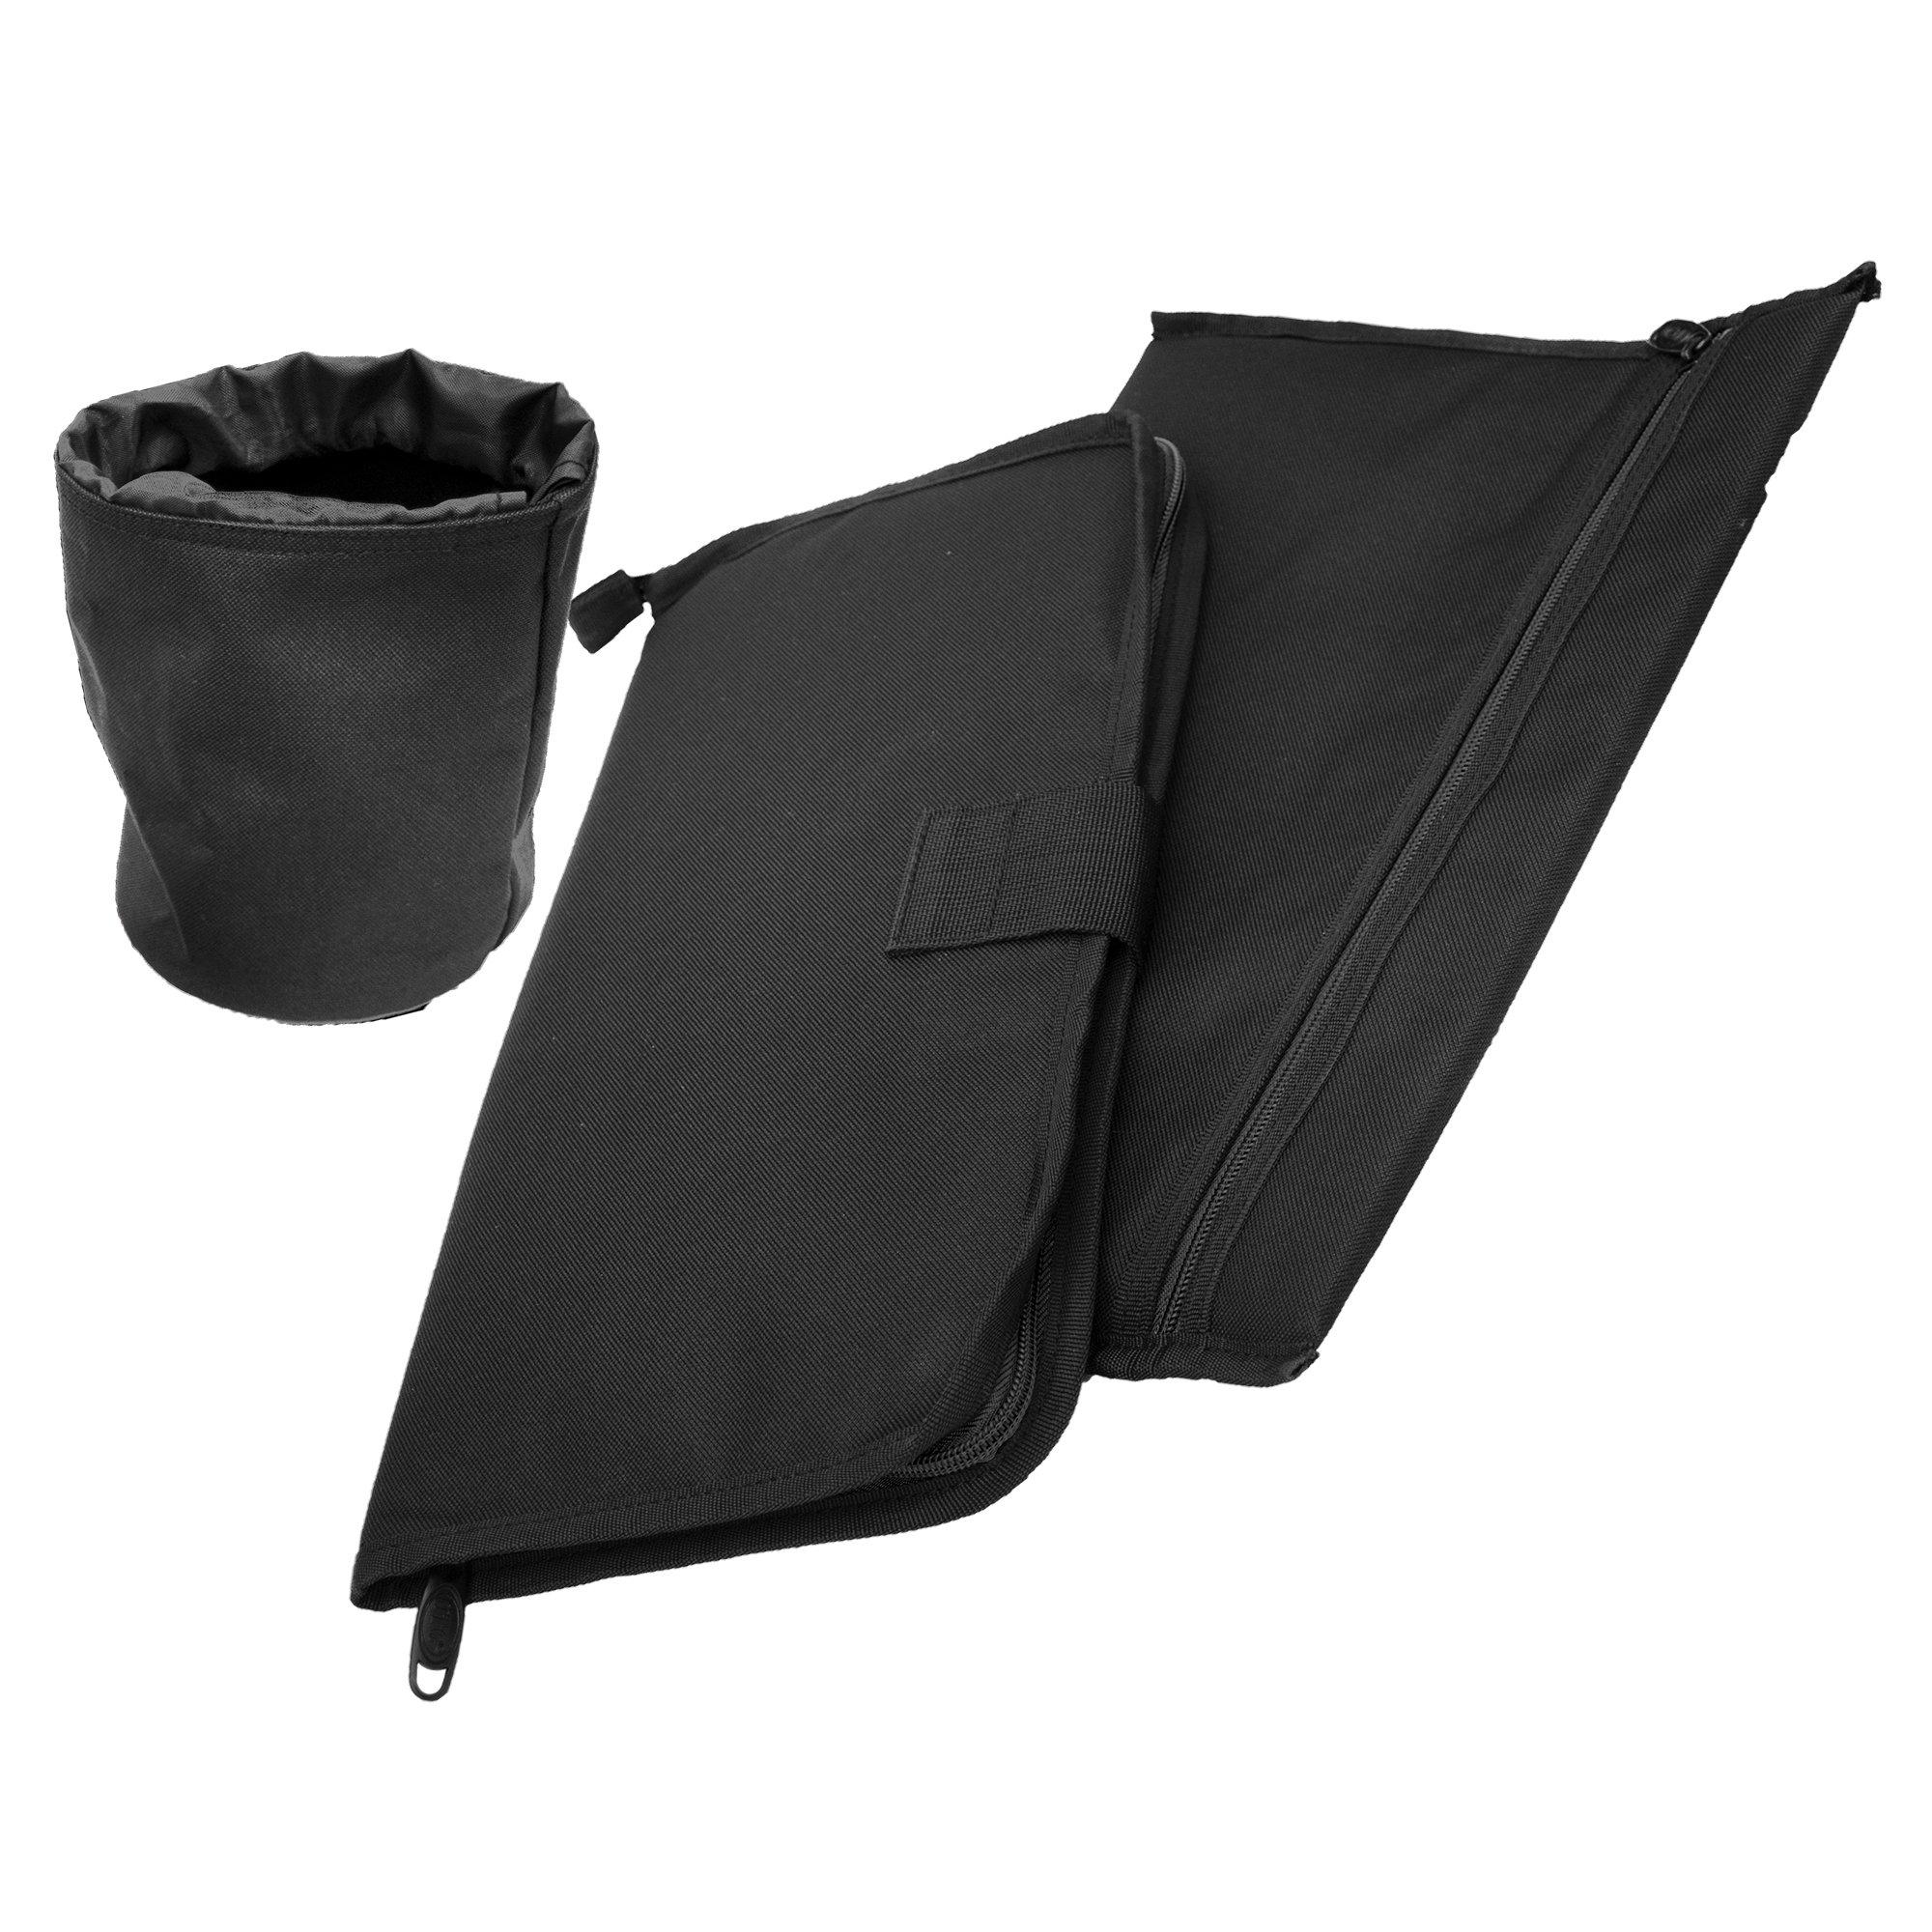 UTG All in One Range/Utility Go Bag, Black, 21'' x 10'' x 9'' by UTG (Image #14)